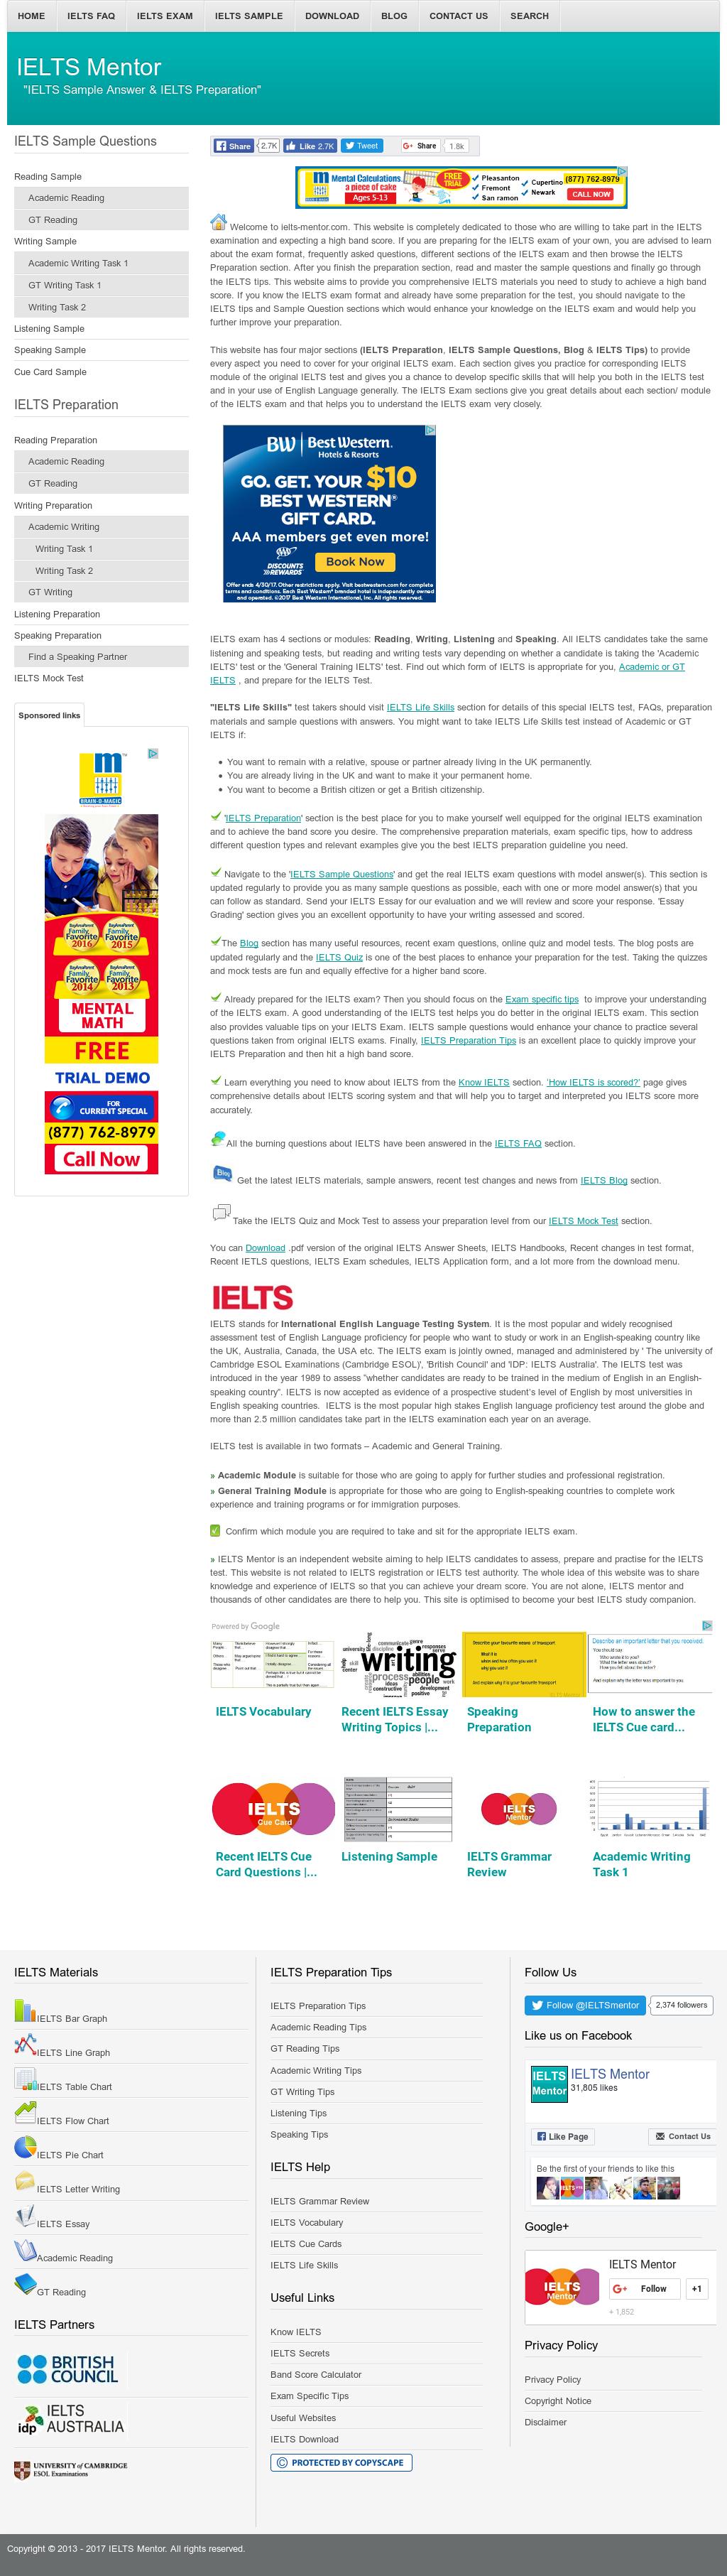 Owler Reports - Ielts Mentor Blog IELTS Academic Reading Test 3